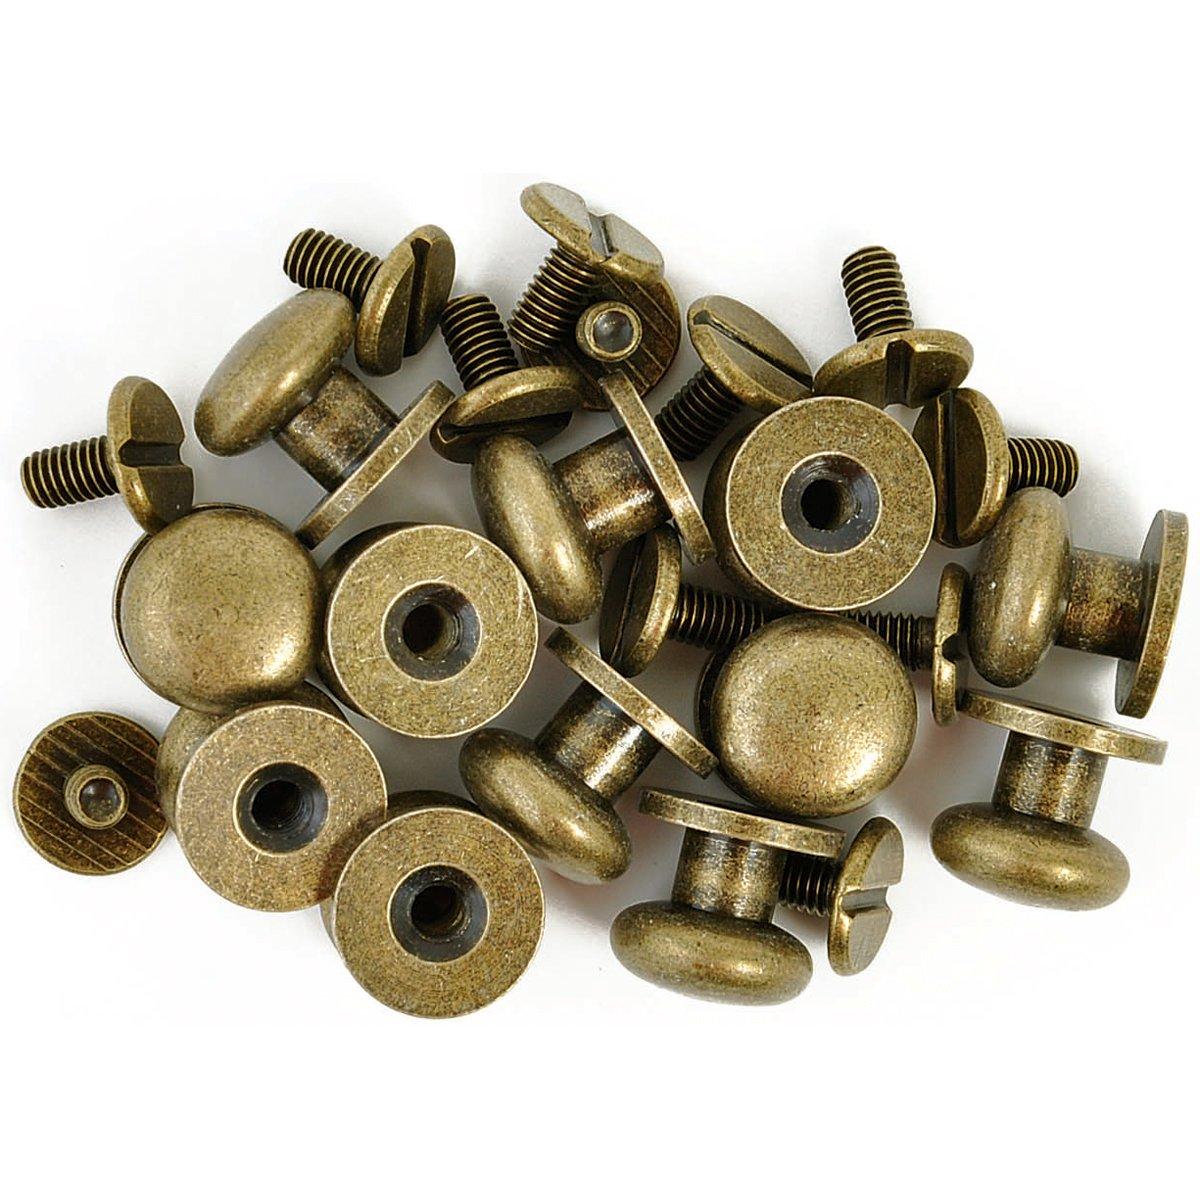 "Kaisercraft TM812 Treasures Metal Drawer Knob, 0.375-Inch (3/8""), Antique Brass, 12-Pack"